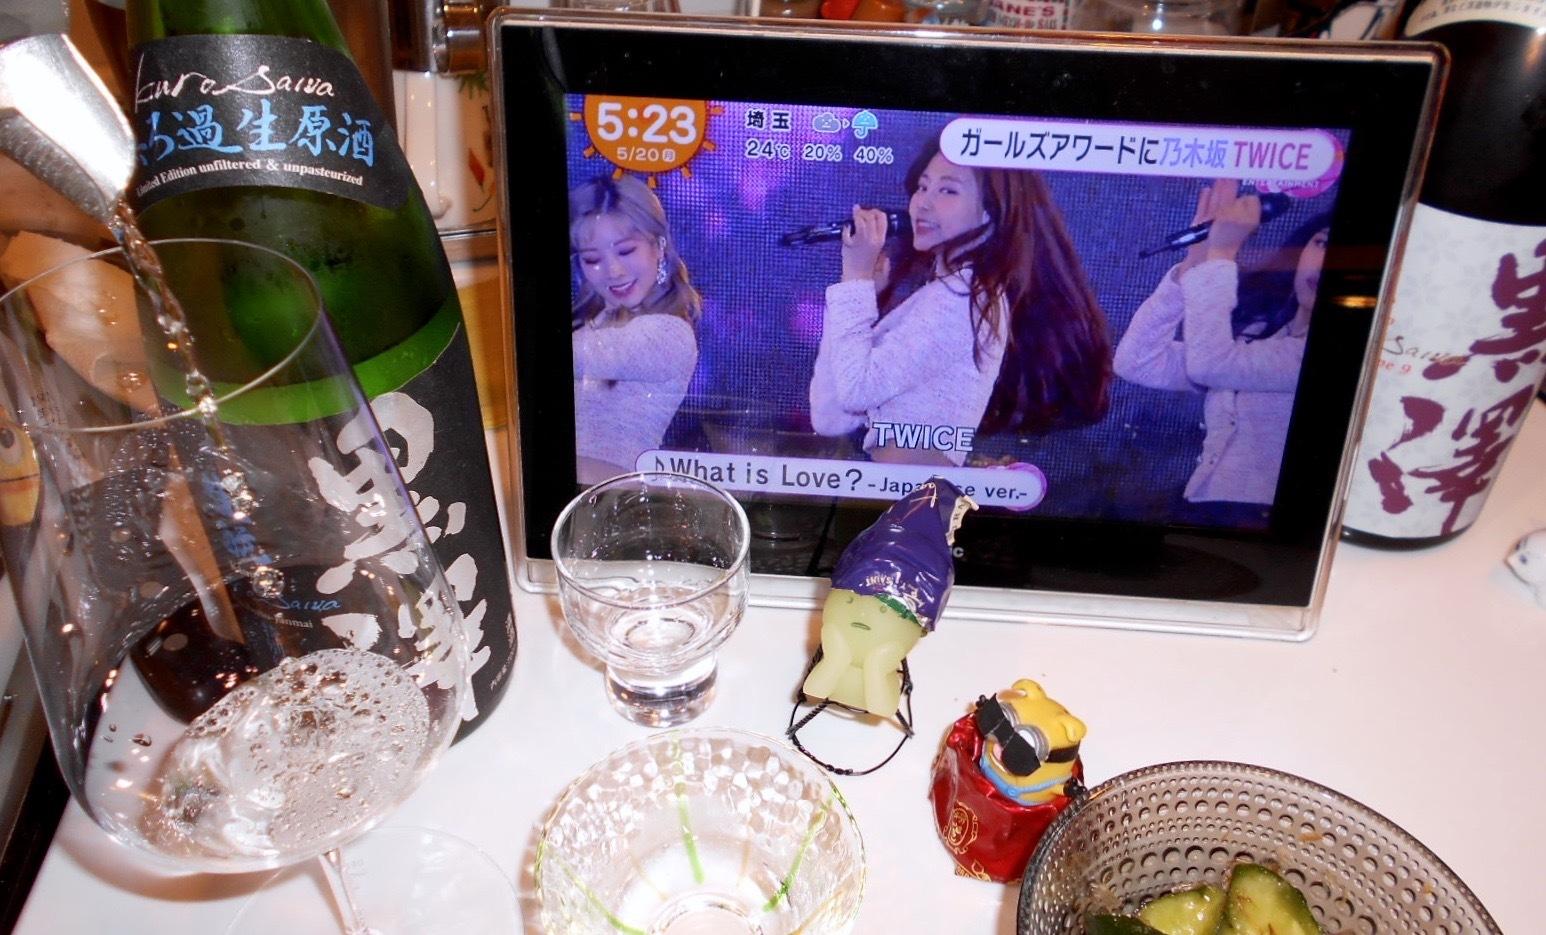 kurosawa_tokujun30by5.jpg